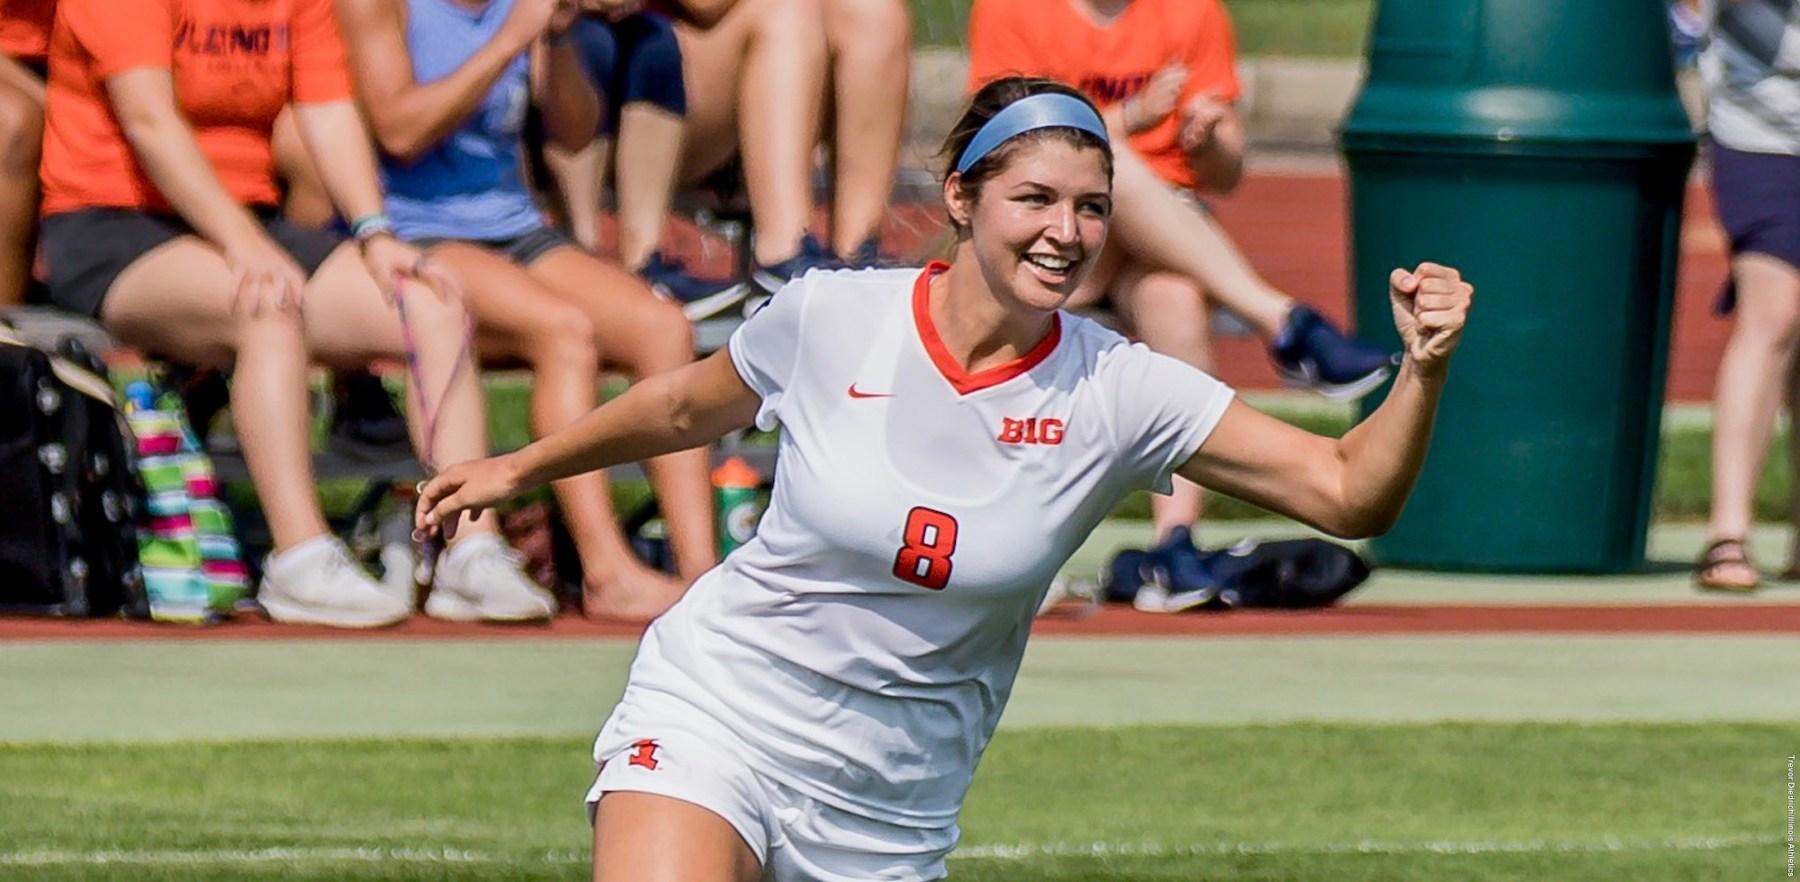 Illini freshman Caroline Ratz celebrates with a raised first